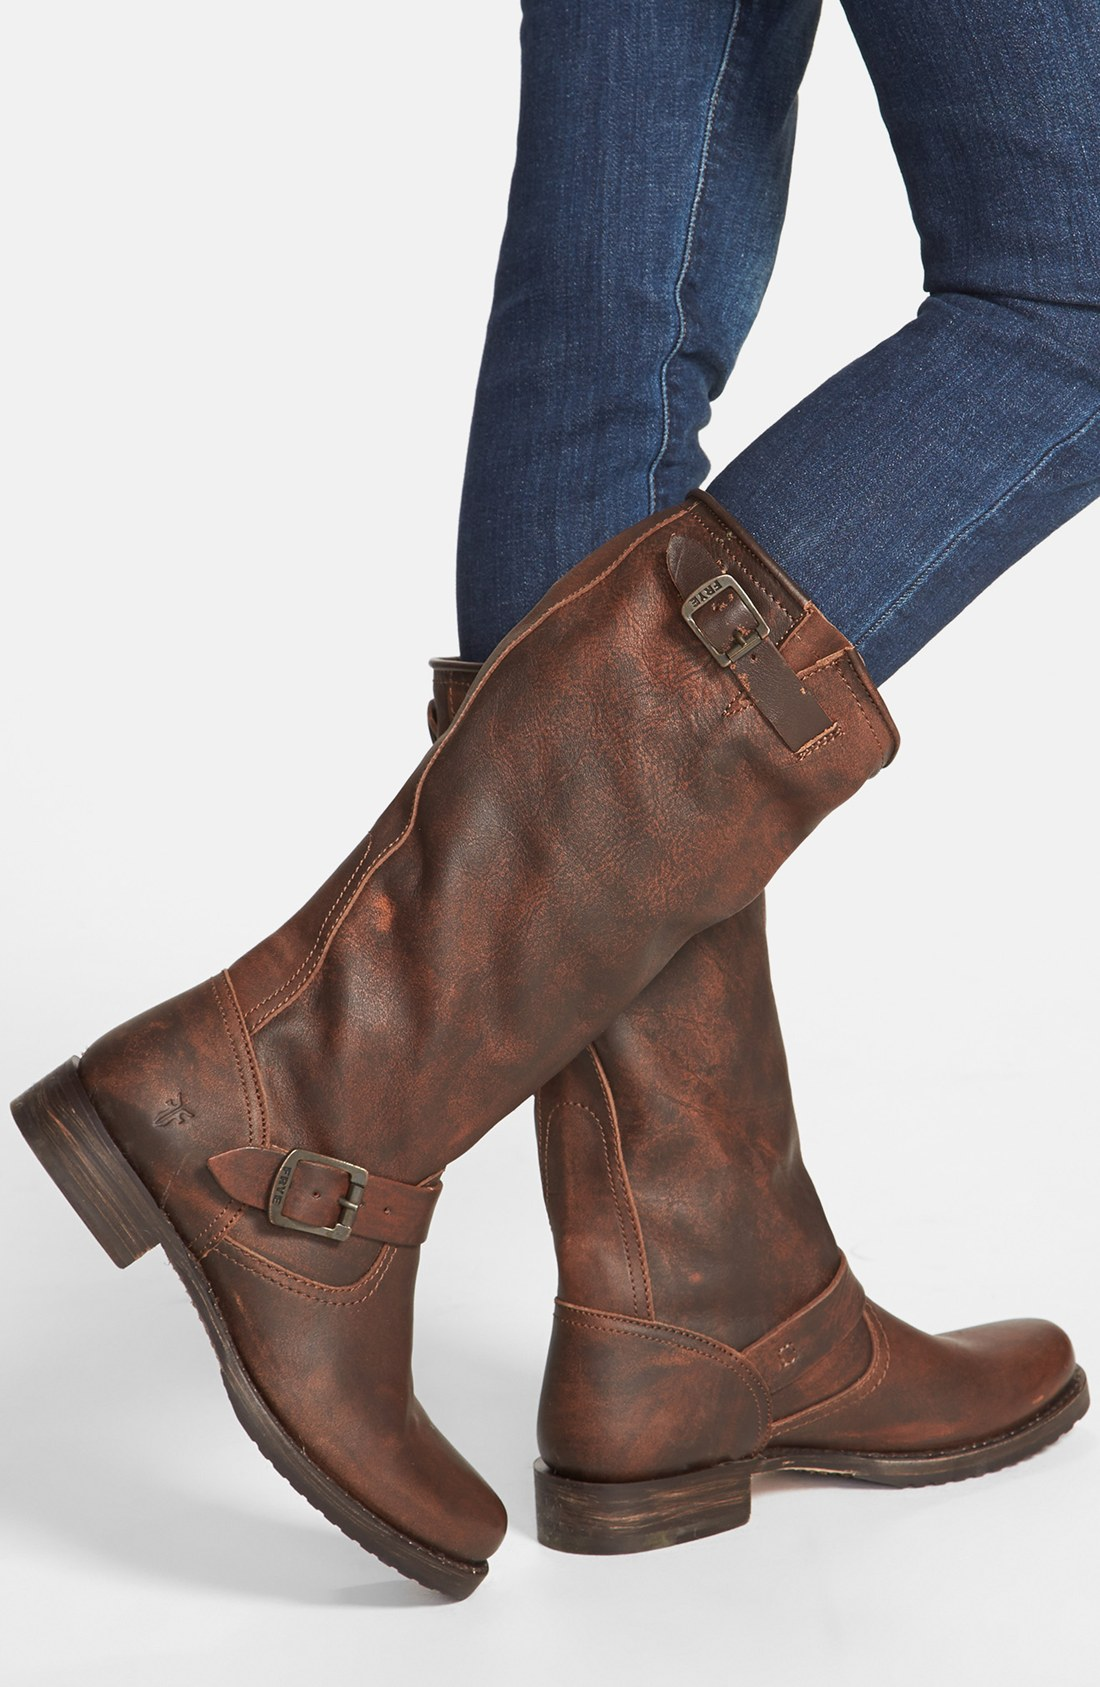 Frye Womens Shoes Uk